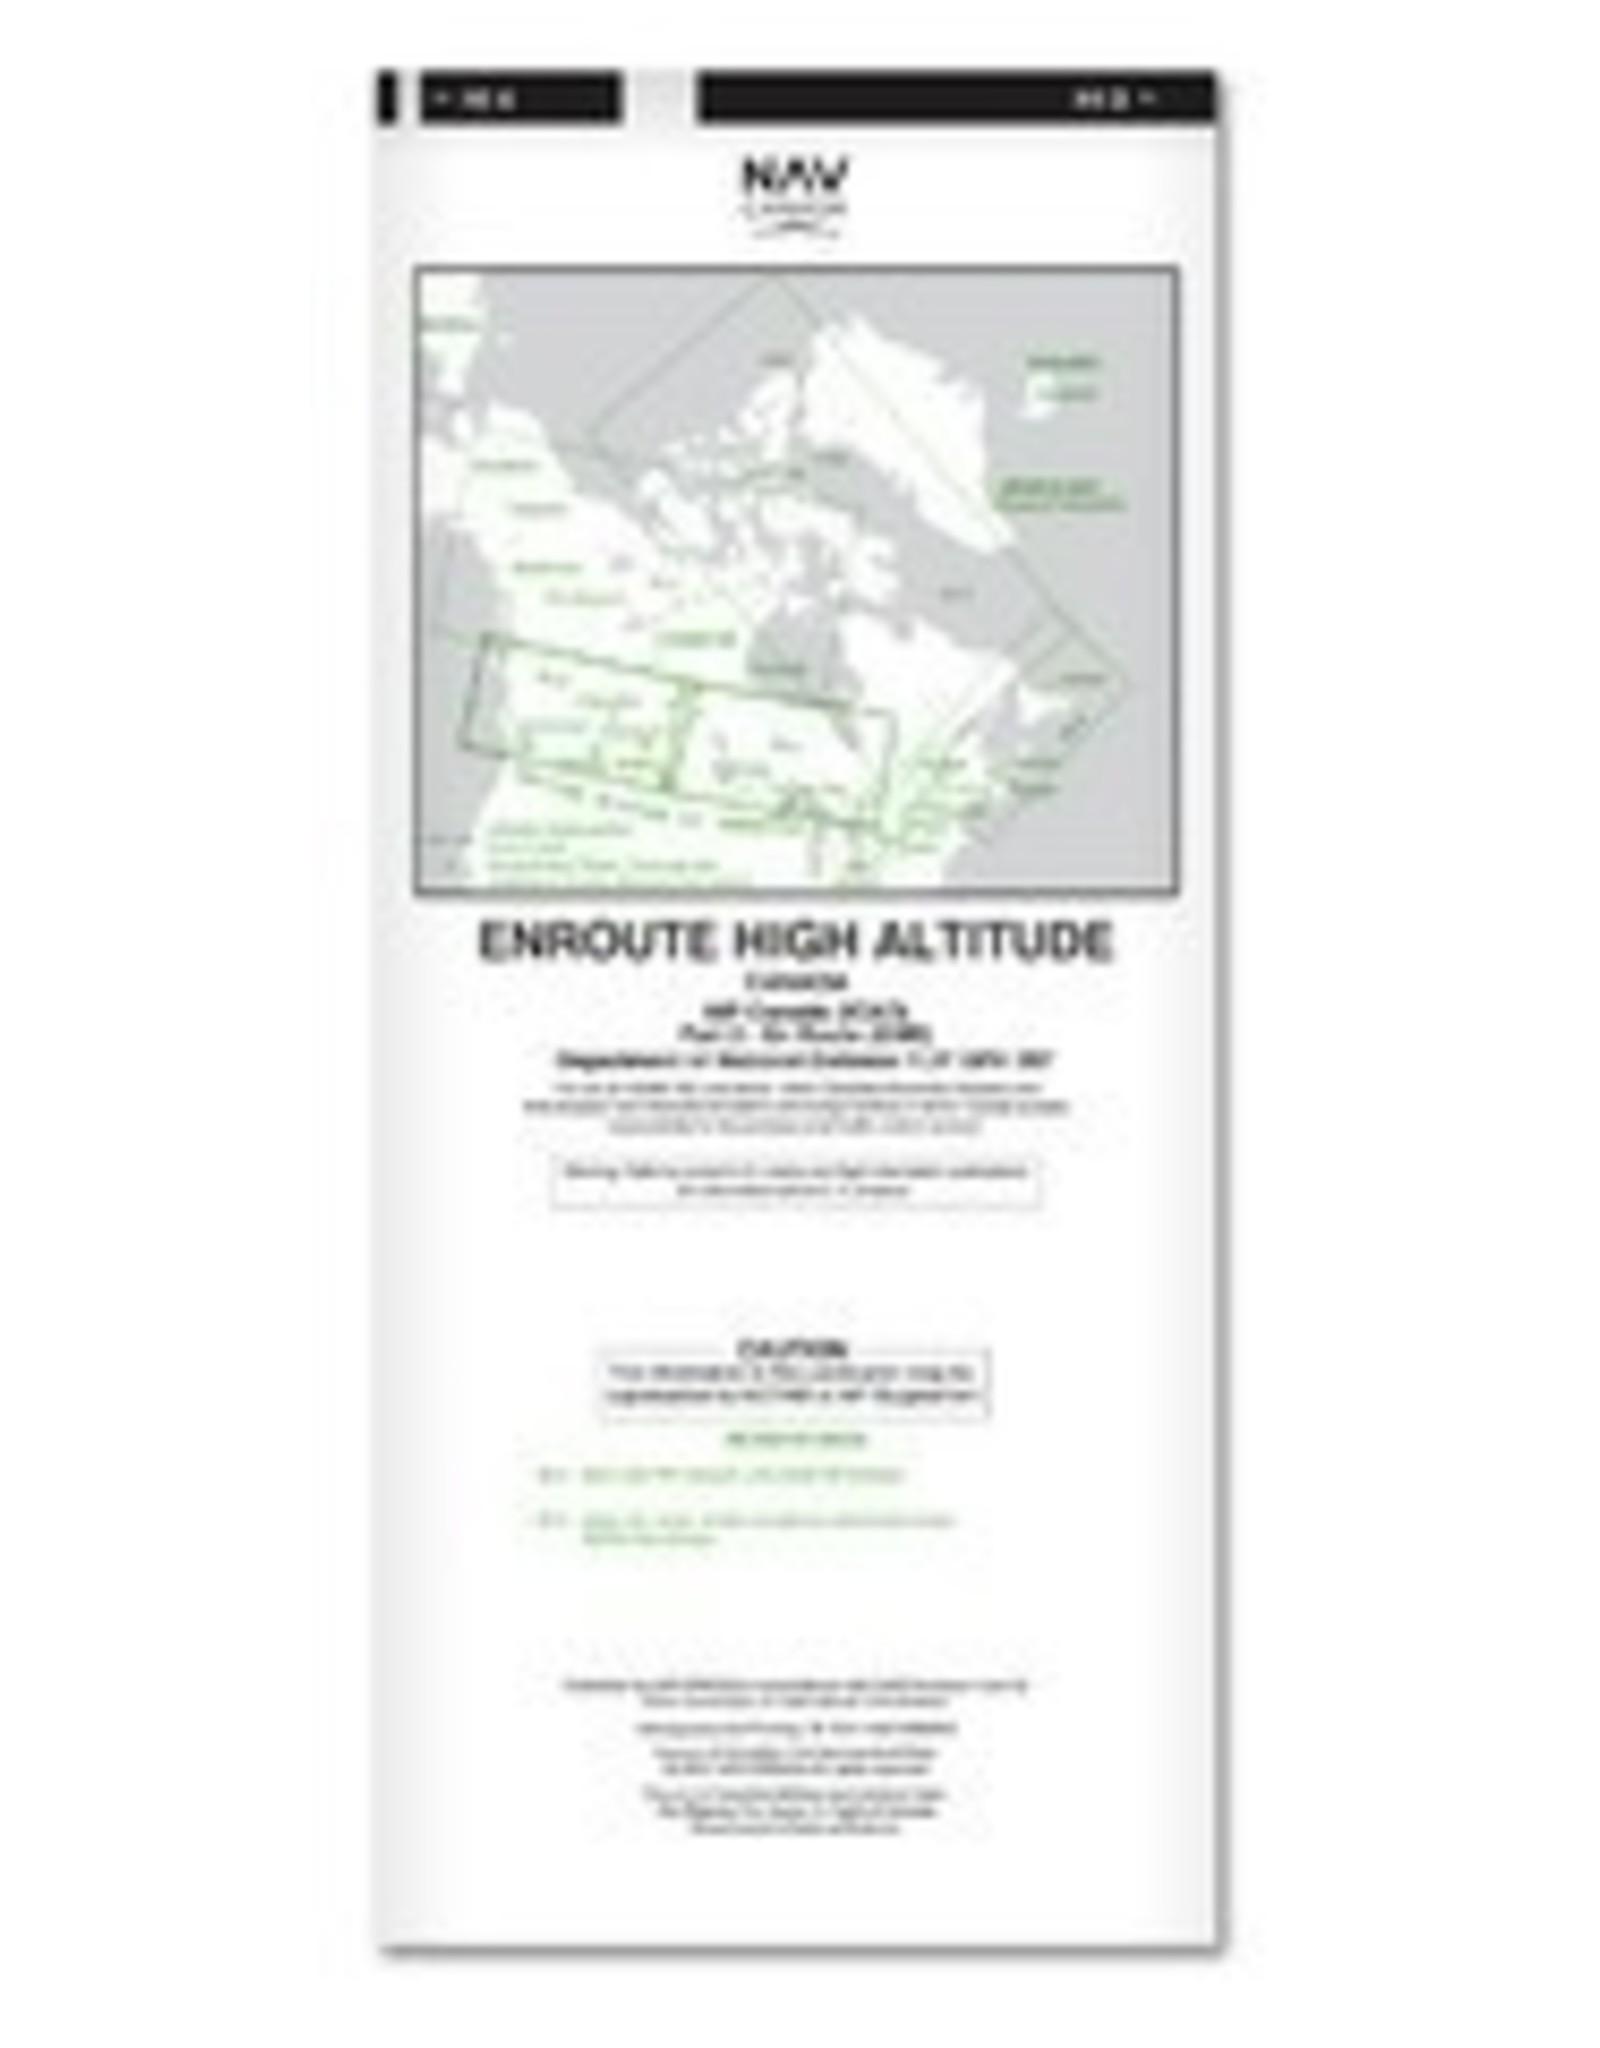 HI 3/4 Enroute High Altitude - Apr 22, 21 to Jun 17, 21